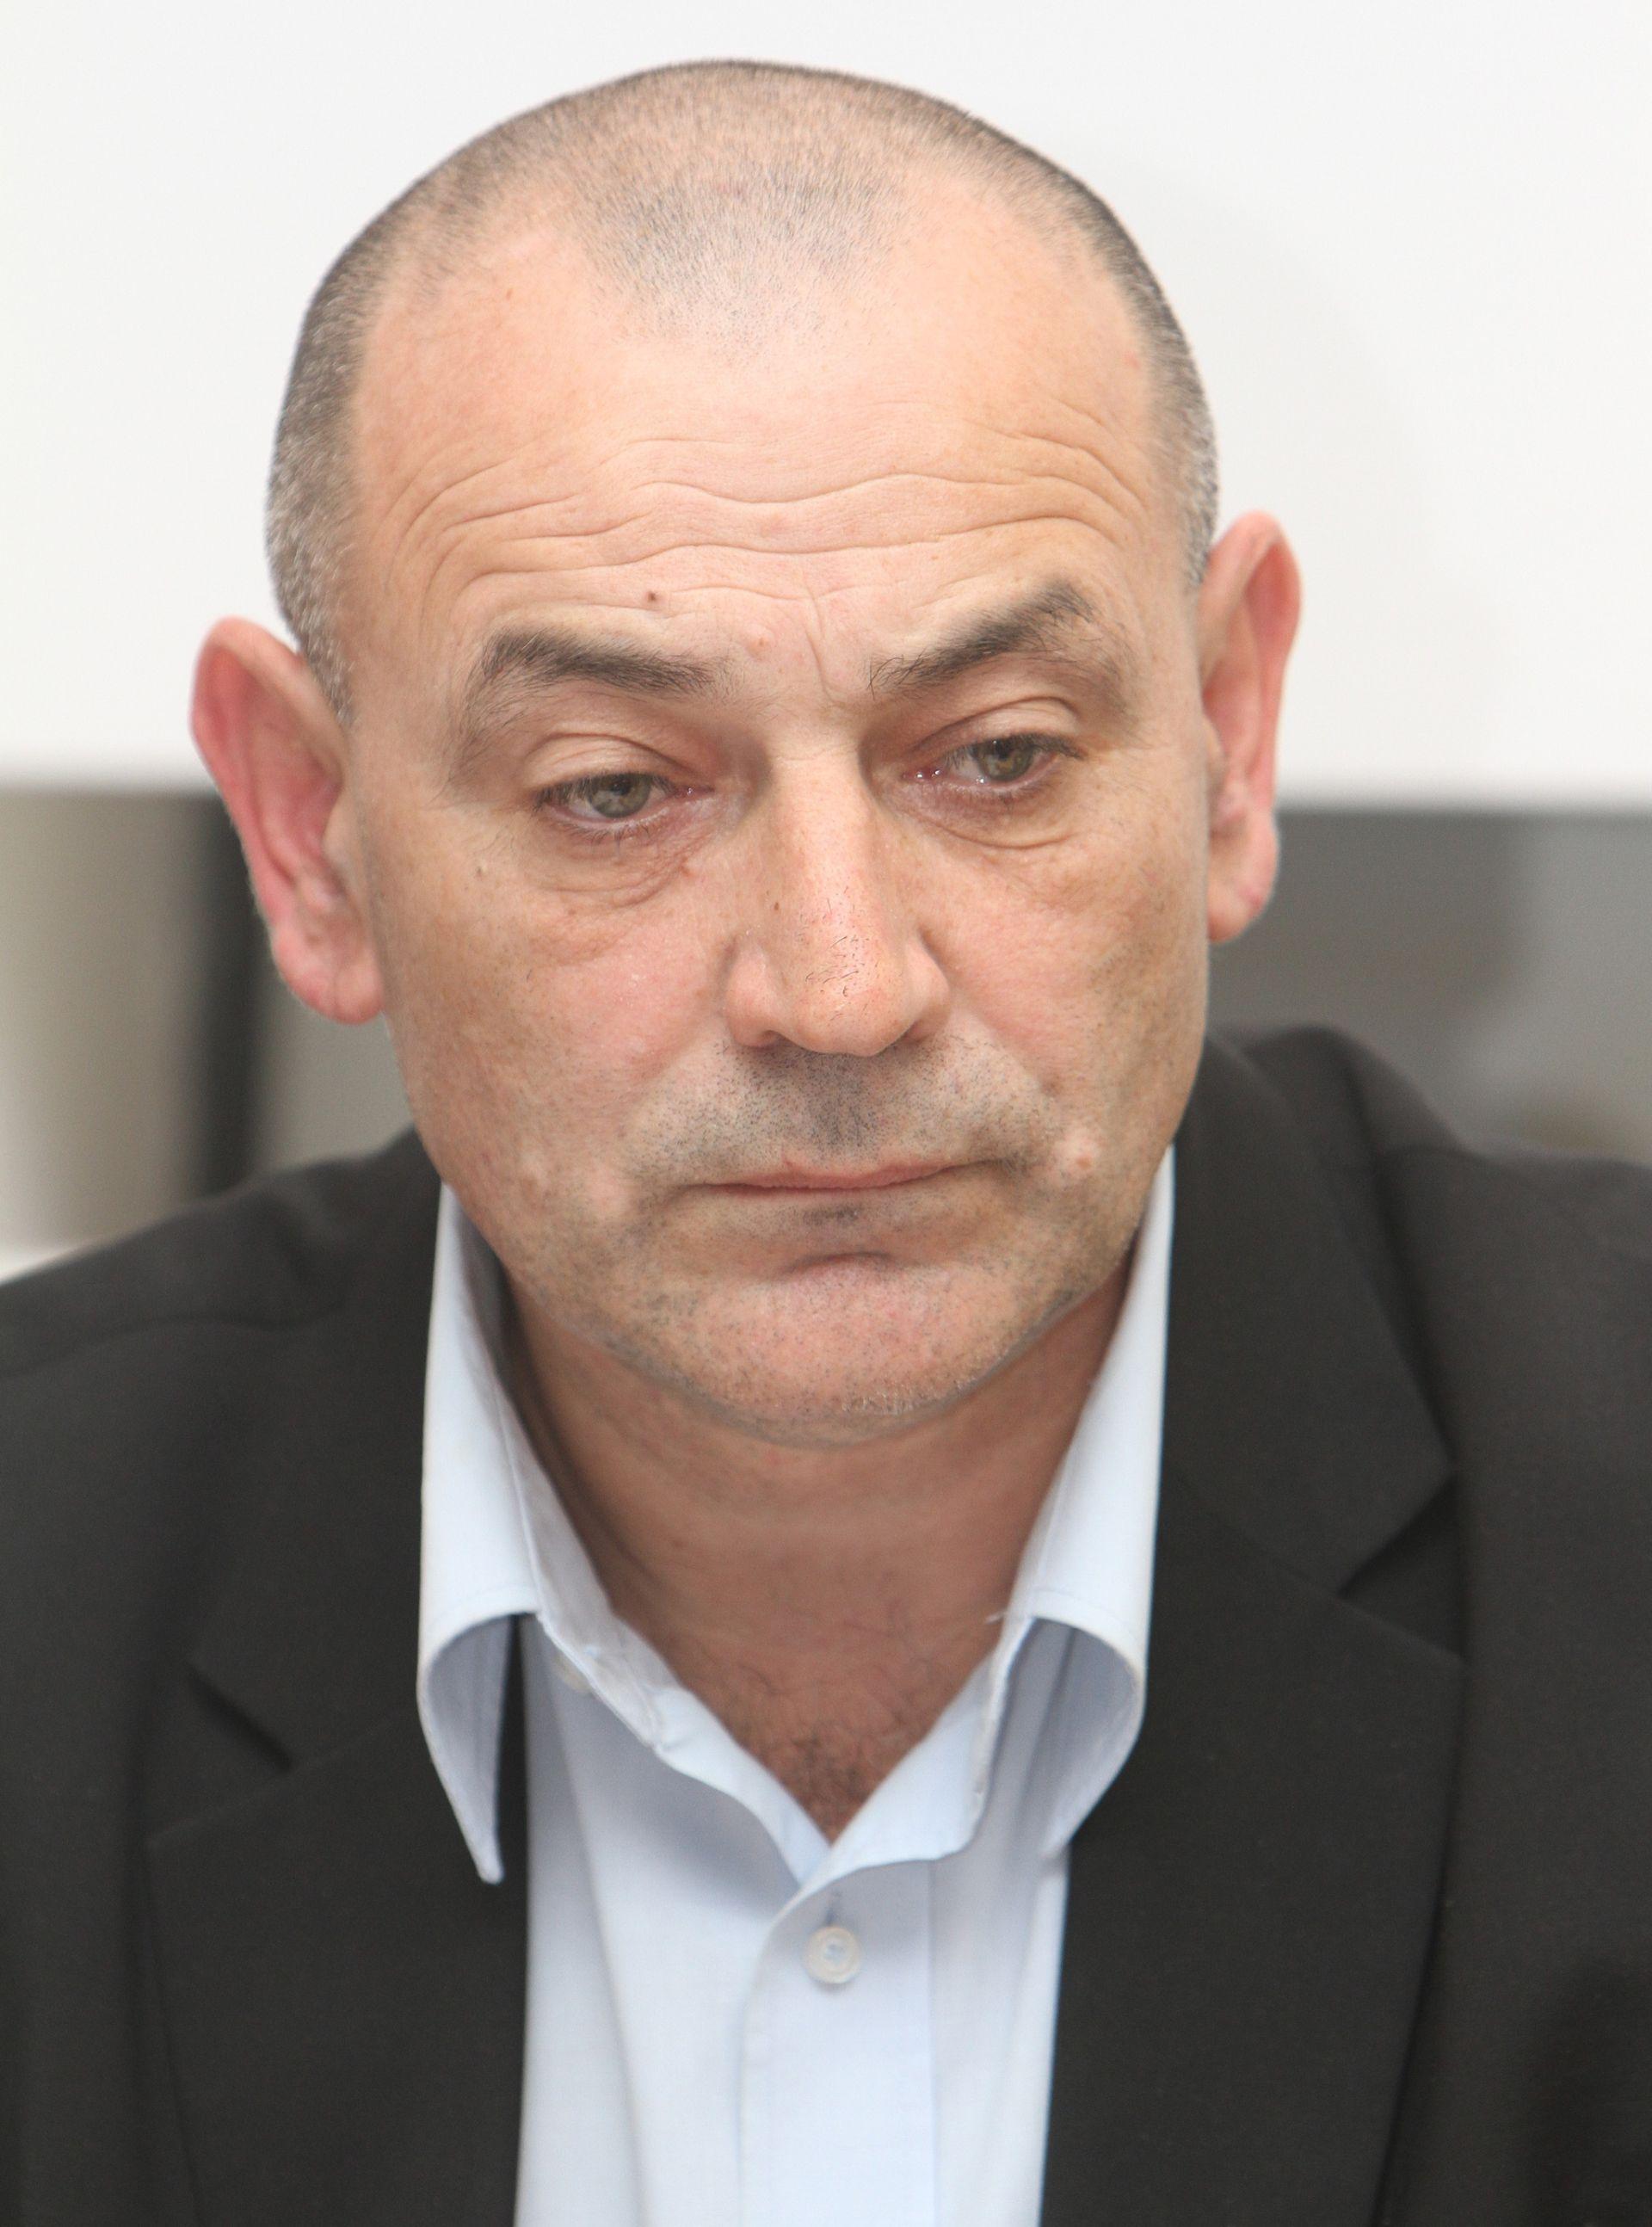 PREMIJER ĆE SUTRA DOBITI IME NOVOG MINISTRA BRANITELJA Tomo Medved novi kandidat HDZ-a